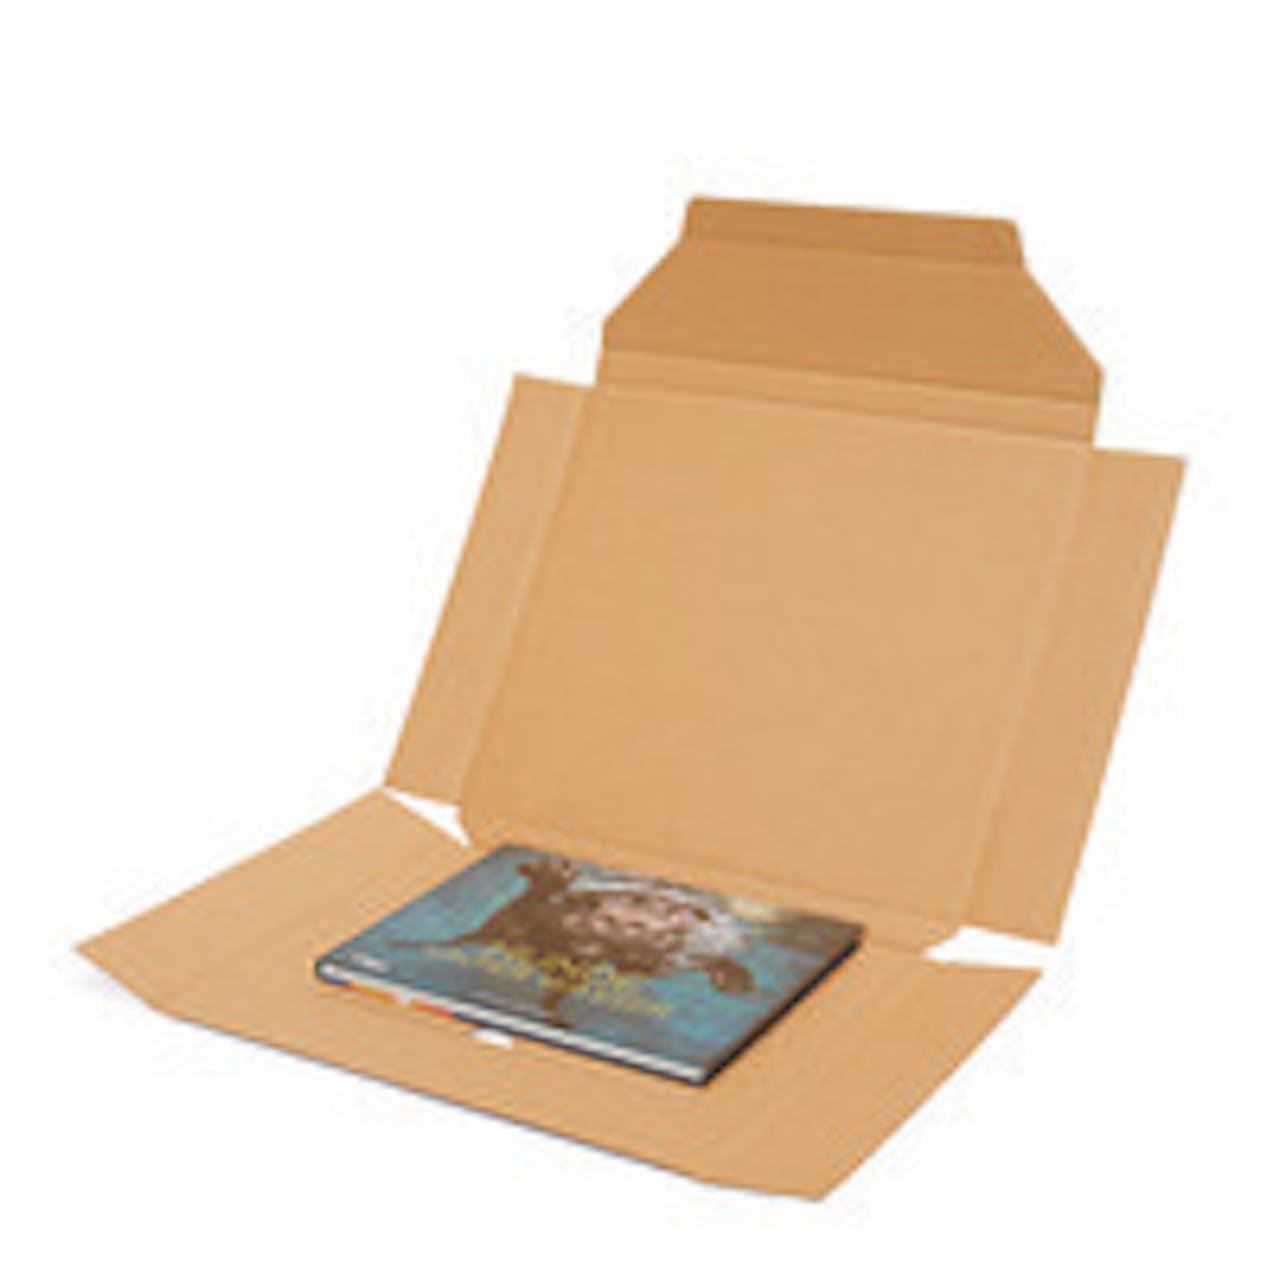 Flach-/Kalender-Pack